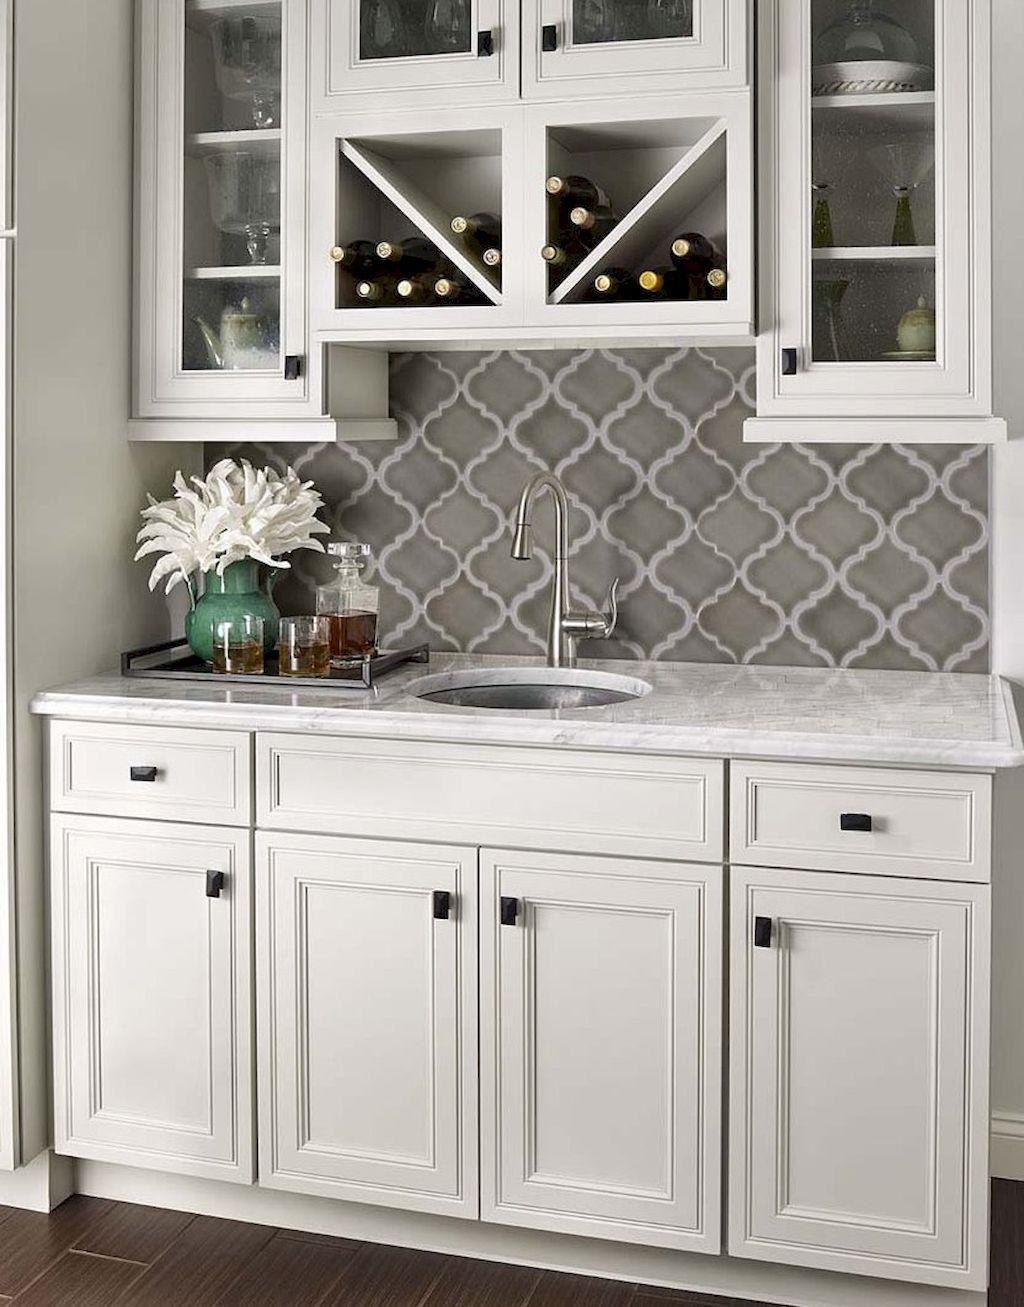 wonderful kitchen backsplash tile ideas kitchens backsplash